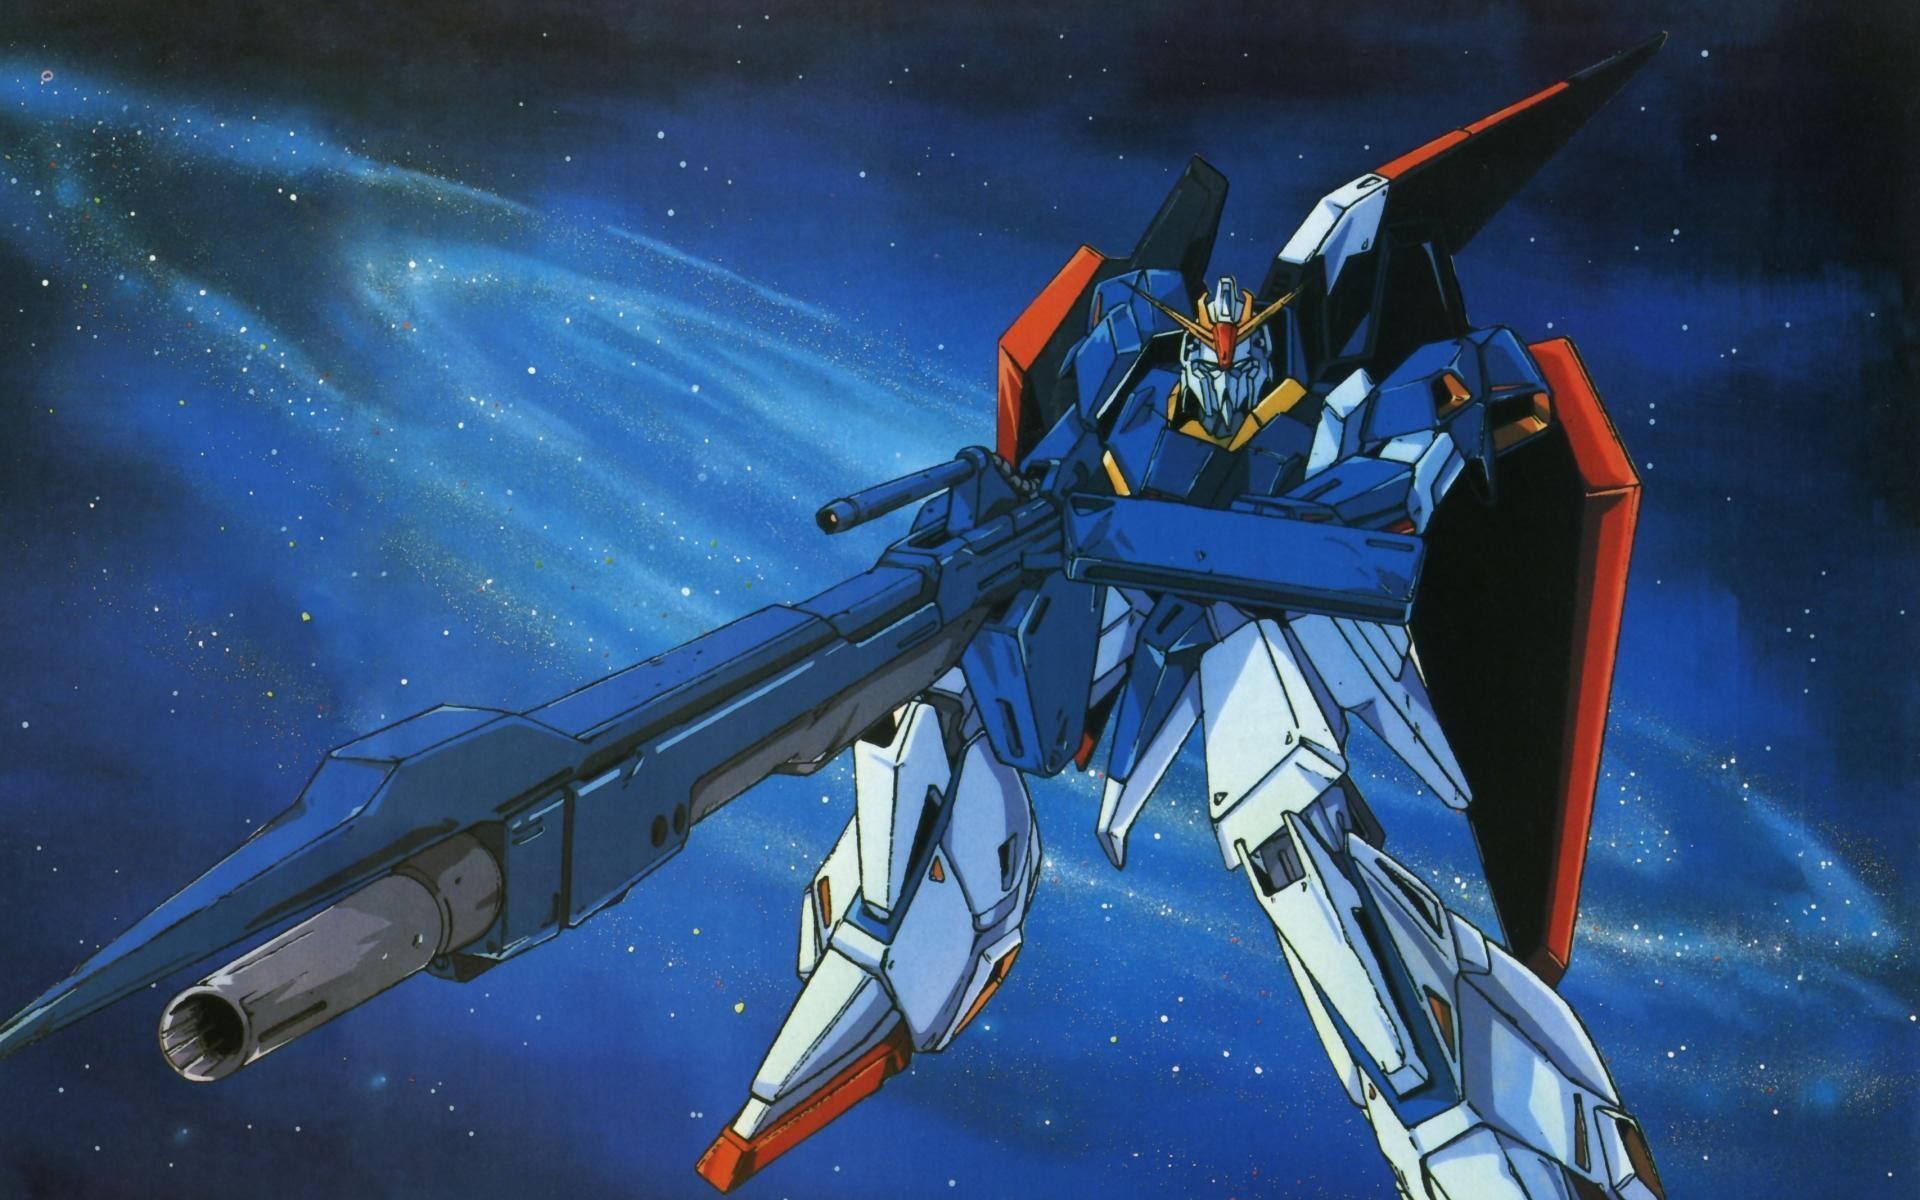 Zeta Gundam Wallpaper 61 Images